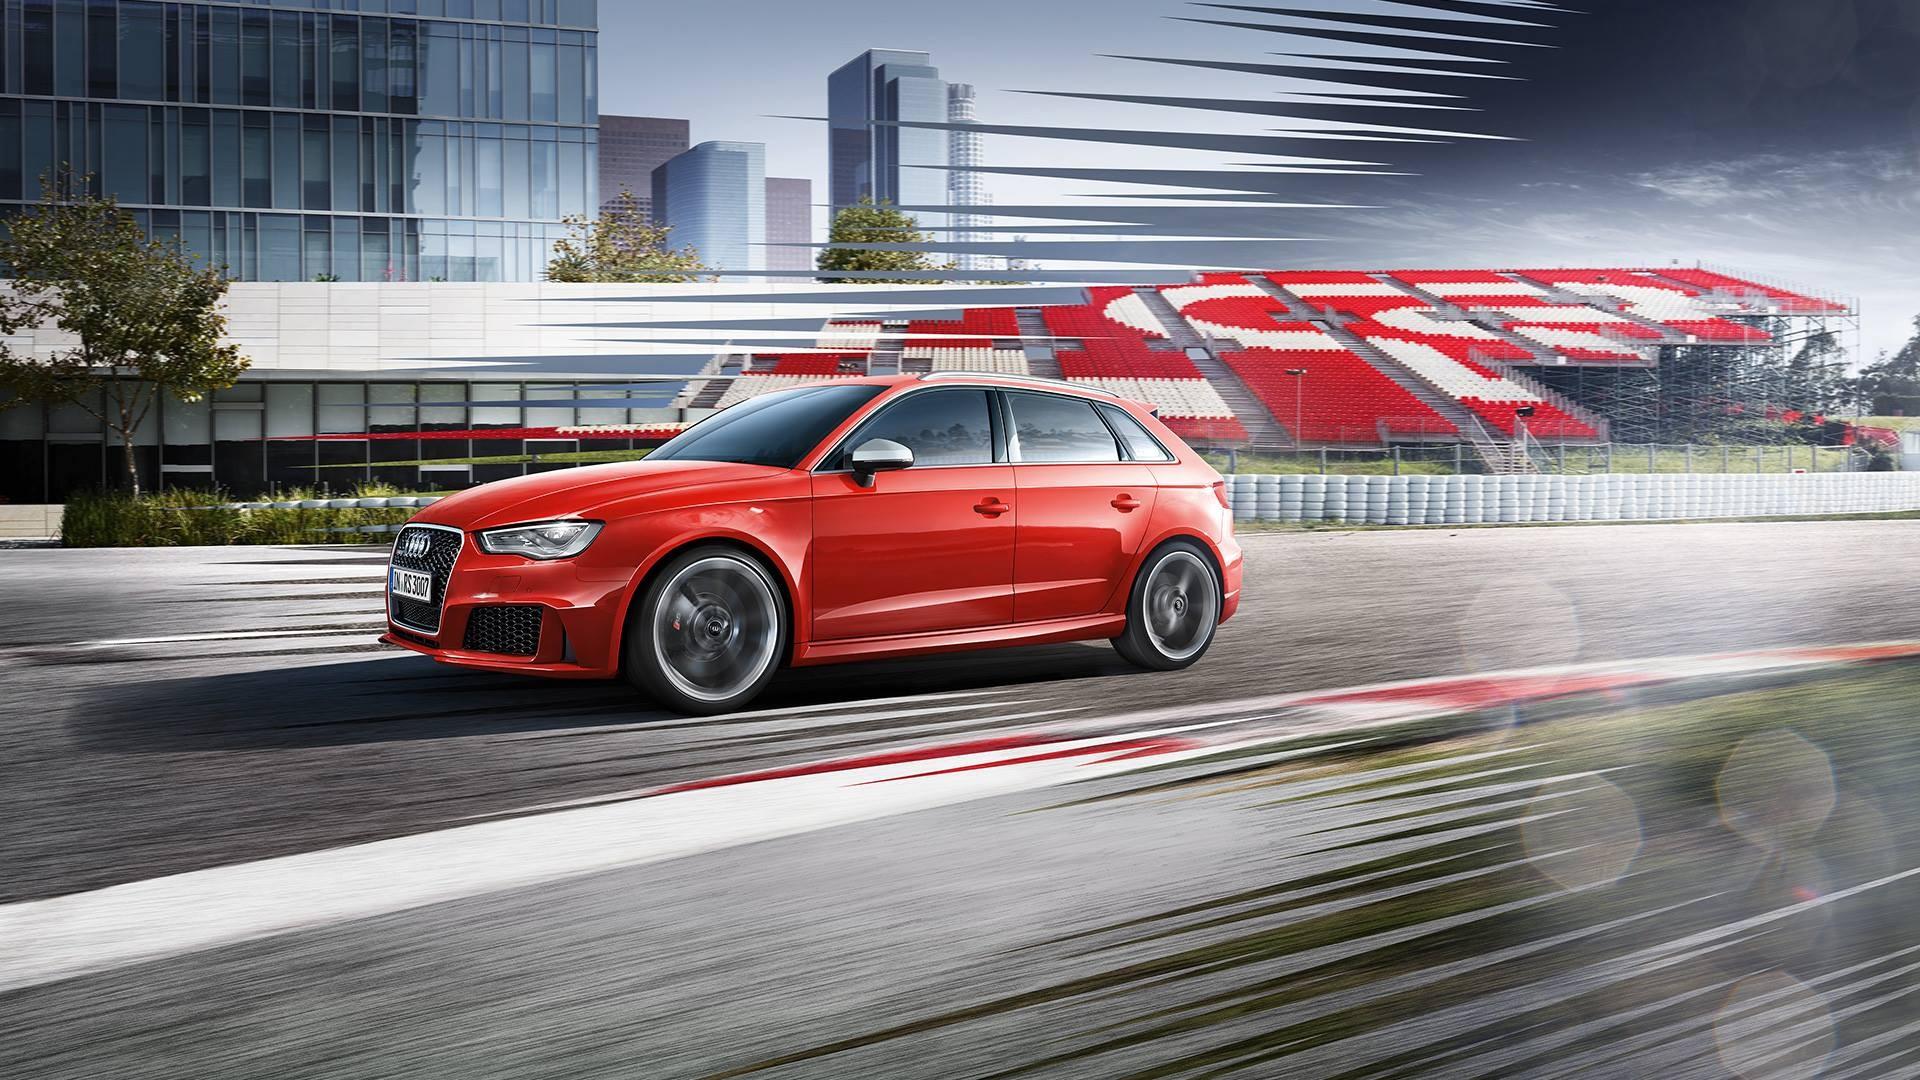 Wallpaper : red cars, Audi S3, sports car, Audi RS3, wheel